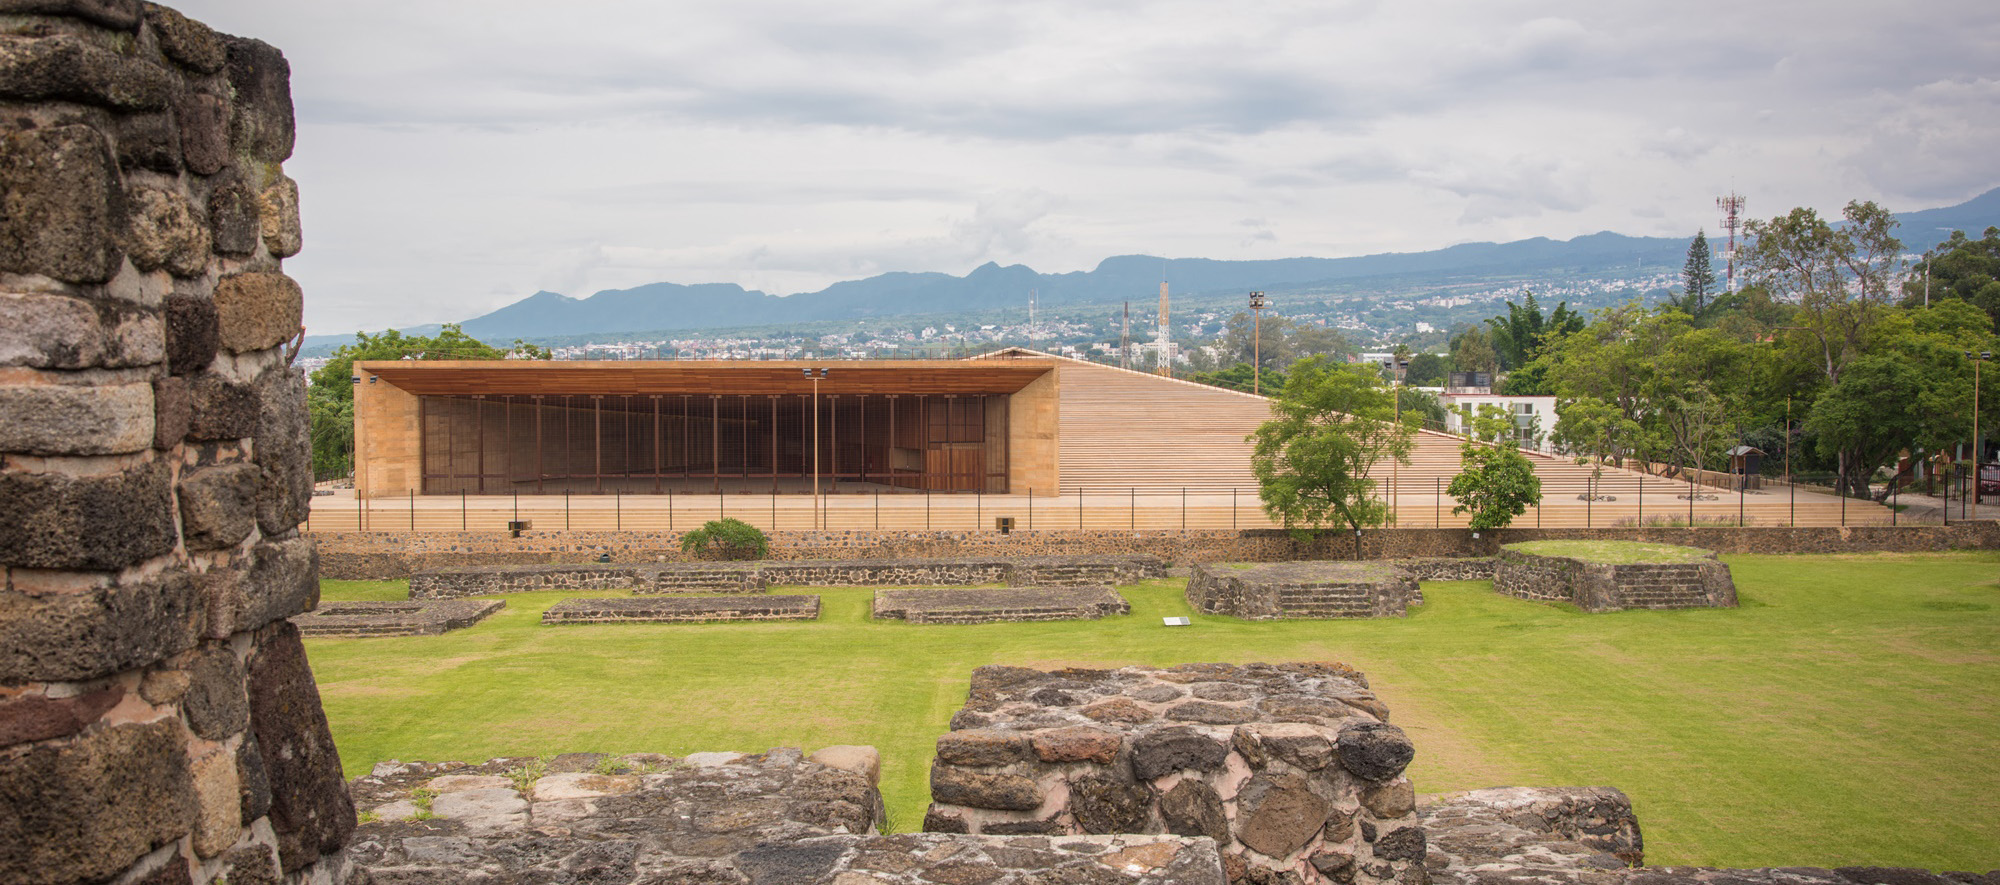 Centro Cultural Teopanzolco por Isaac Broid + PRODUCTORA. Fotografía por Jaime Navarro and Rory Gardiner